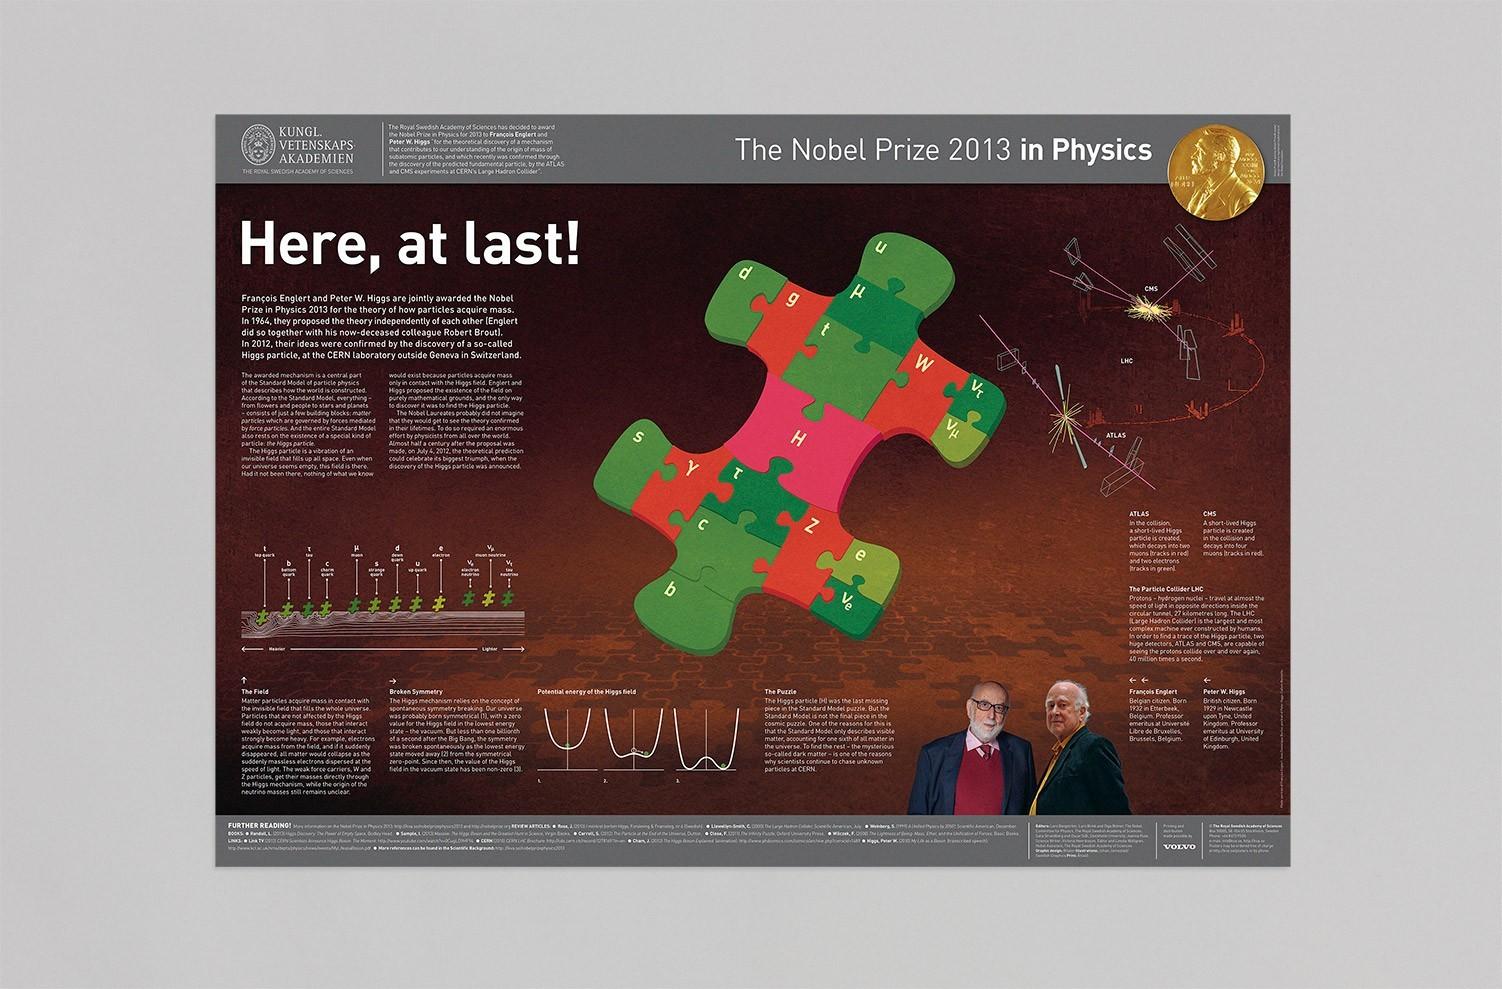 ritator_the_royal_swedish_academy_of_sciences_nobel_posters_3